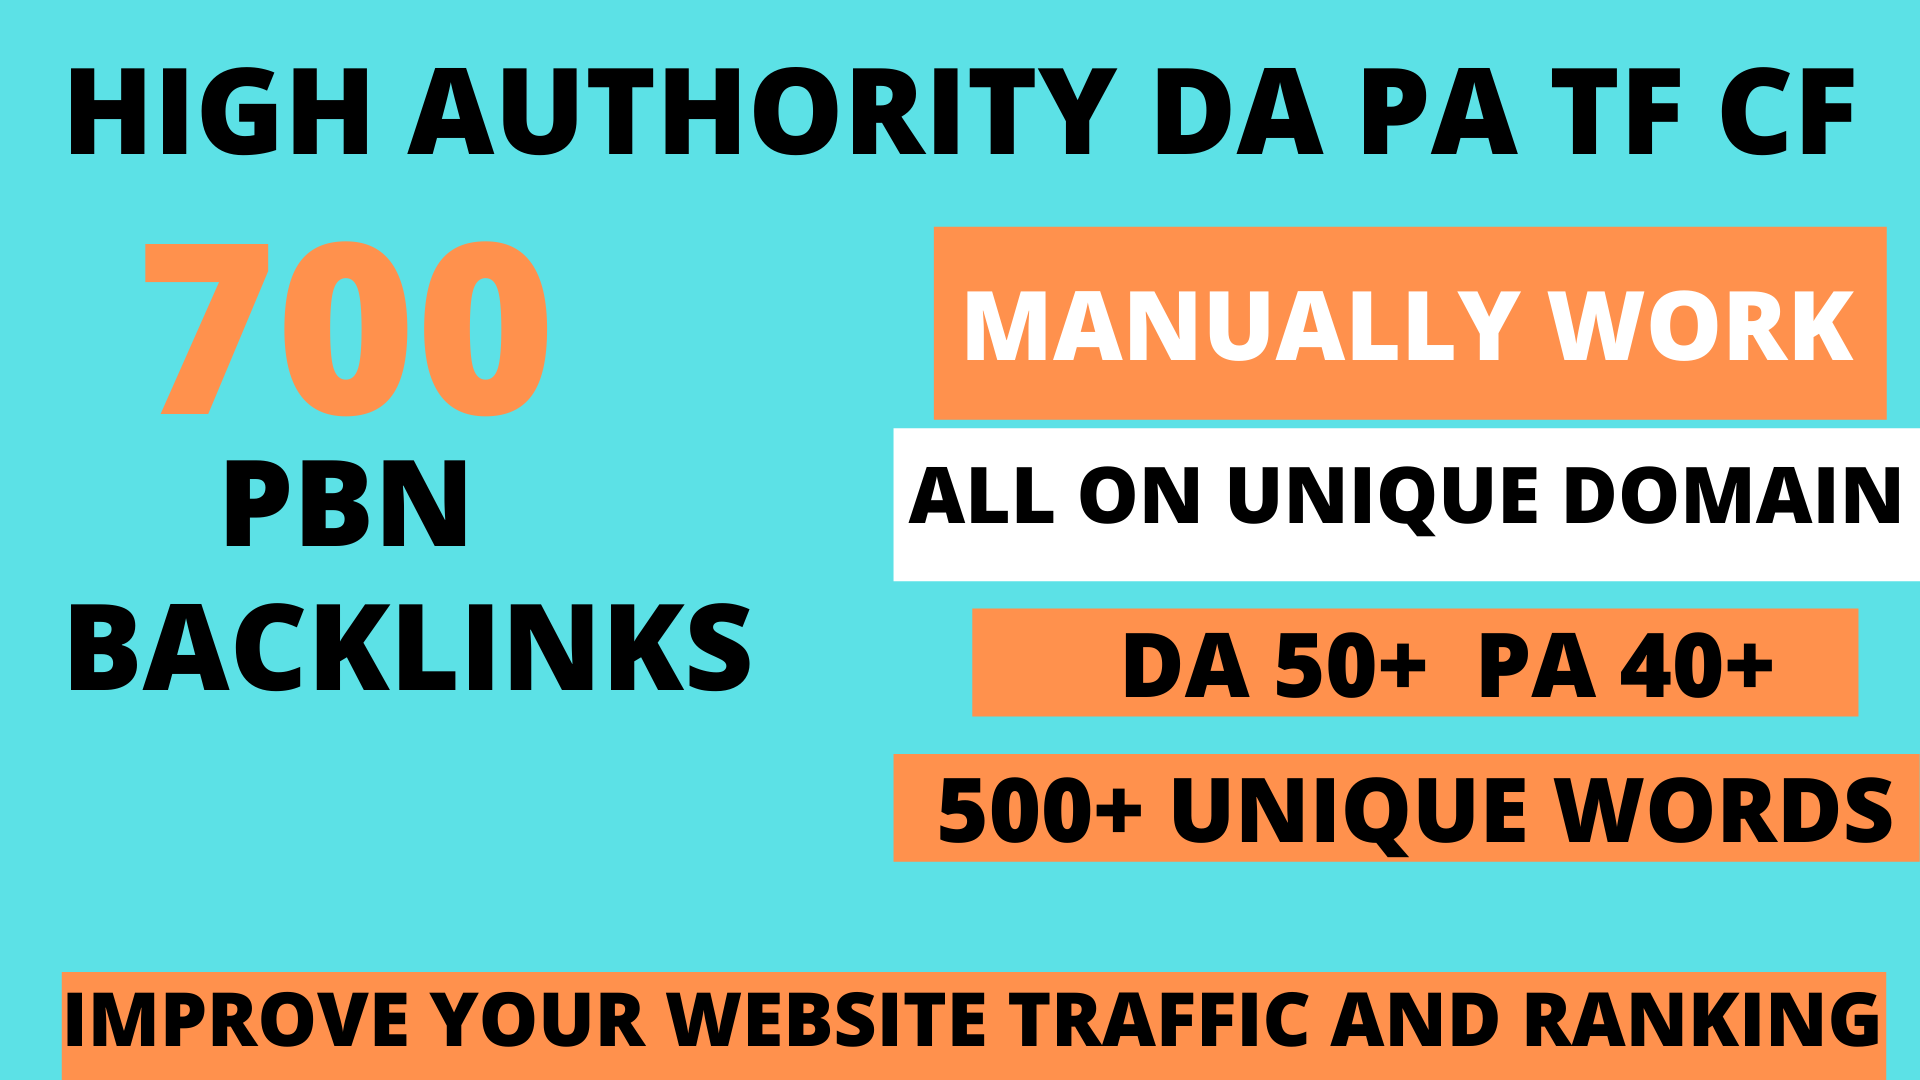 Build 700 web 2.0 DA 50+ PA 40+DR 50+ TF CF Permanent Dofollow backlink